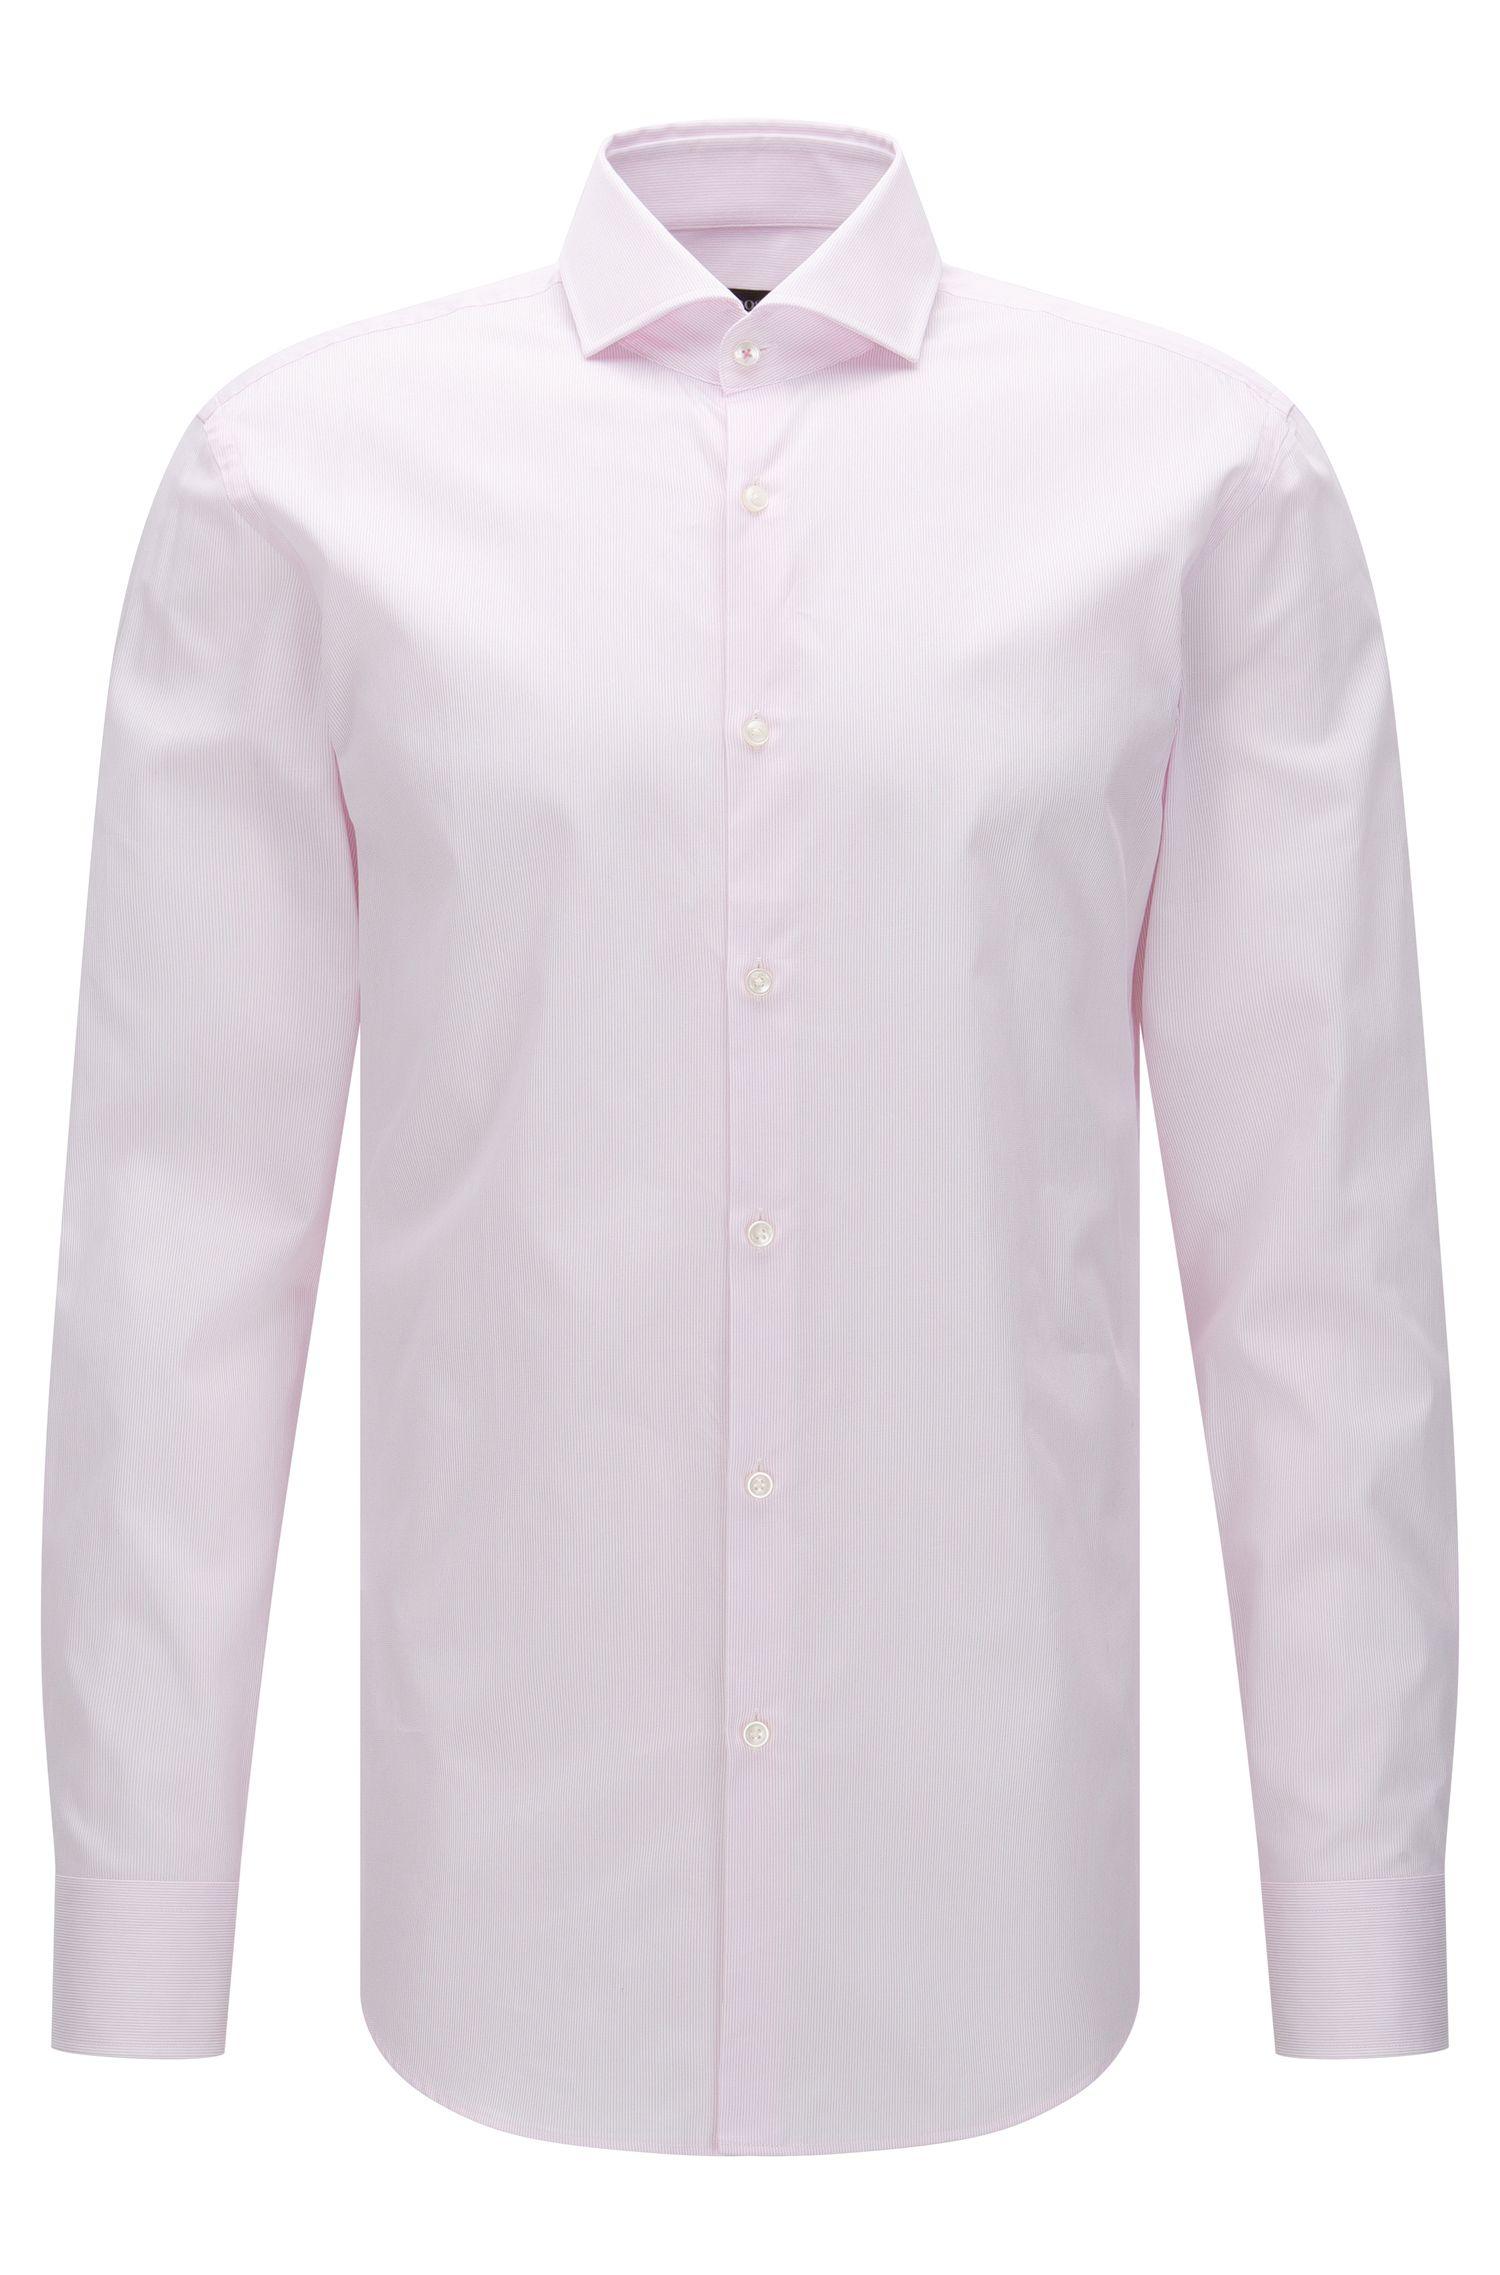 Striped Cotton Dress Shirt, Slim Fit | Jerrin, light pink